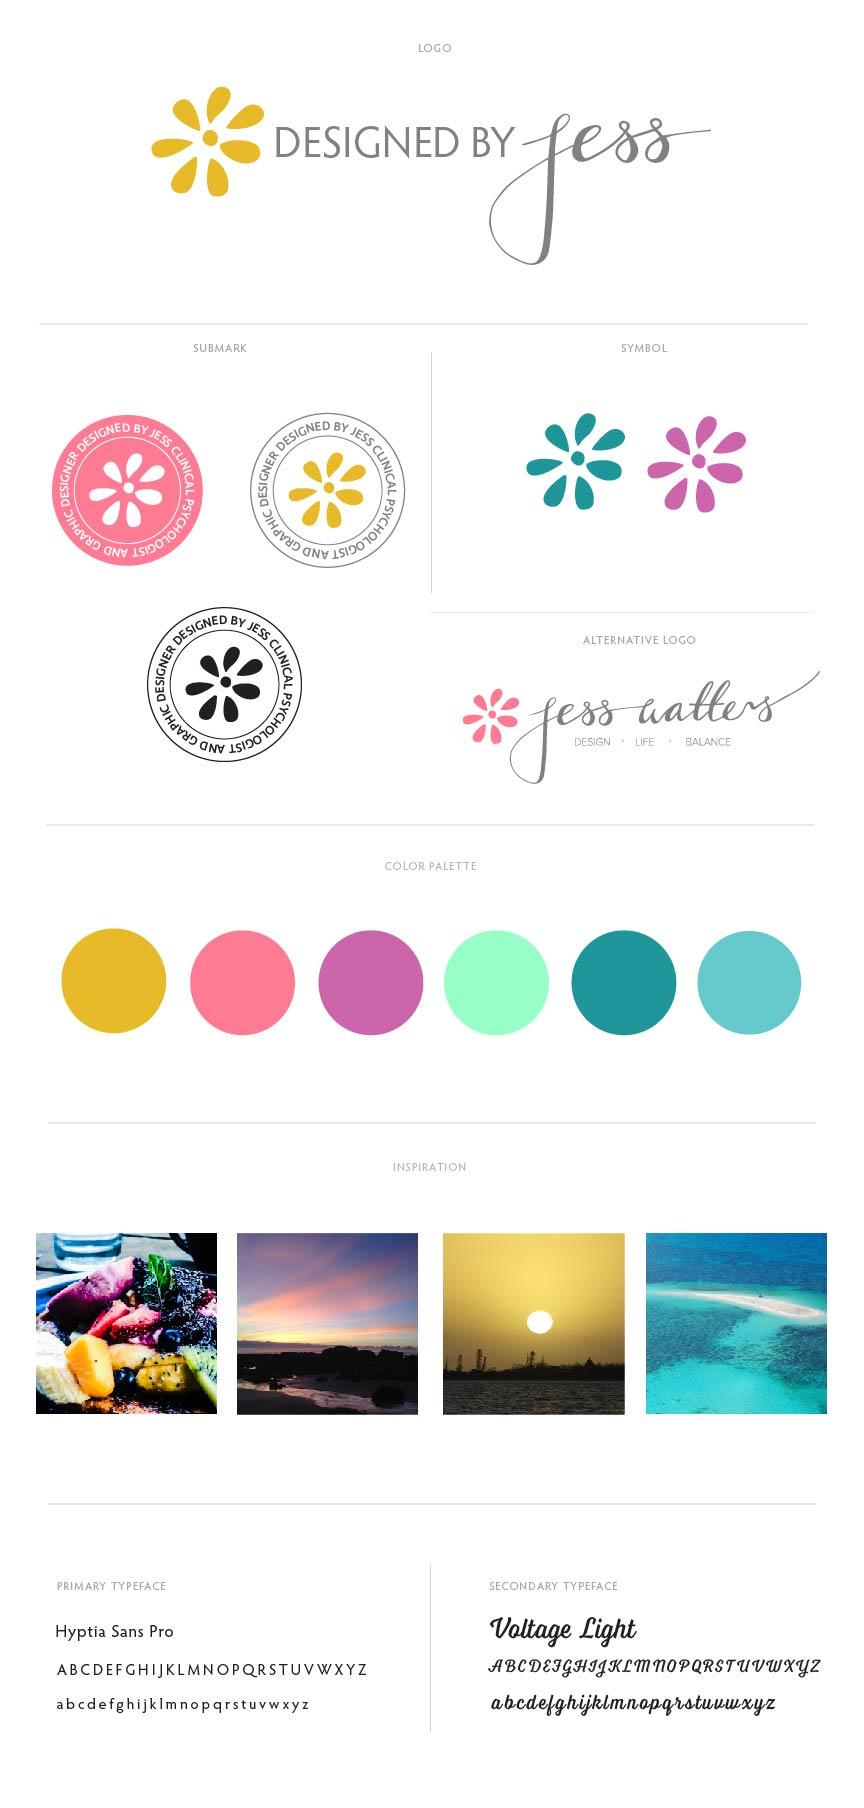 Updated Brand Board - Designed By Jess - Graphic design; branding; logo design and website design.